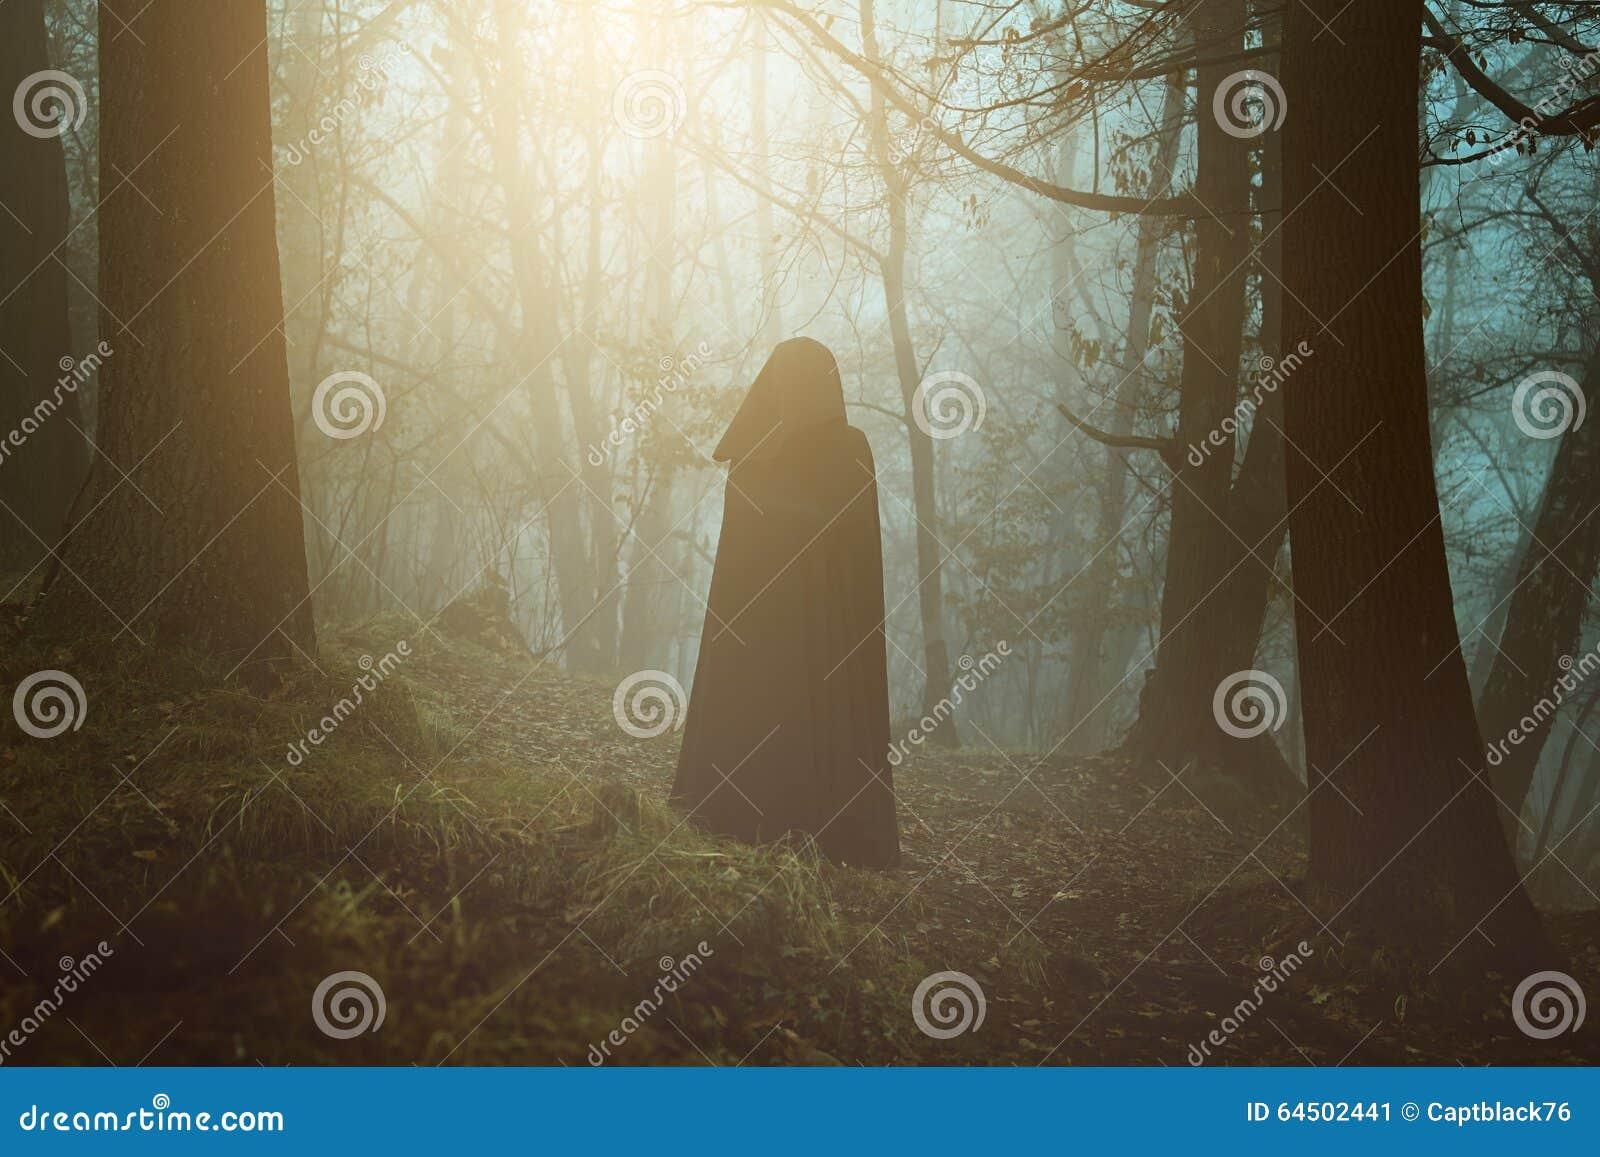 Svart med huva person i en overklig skog